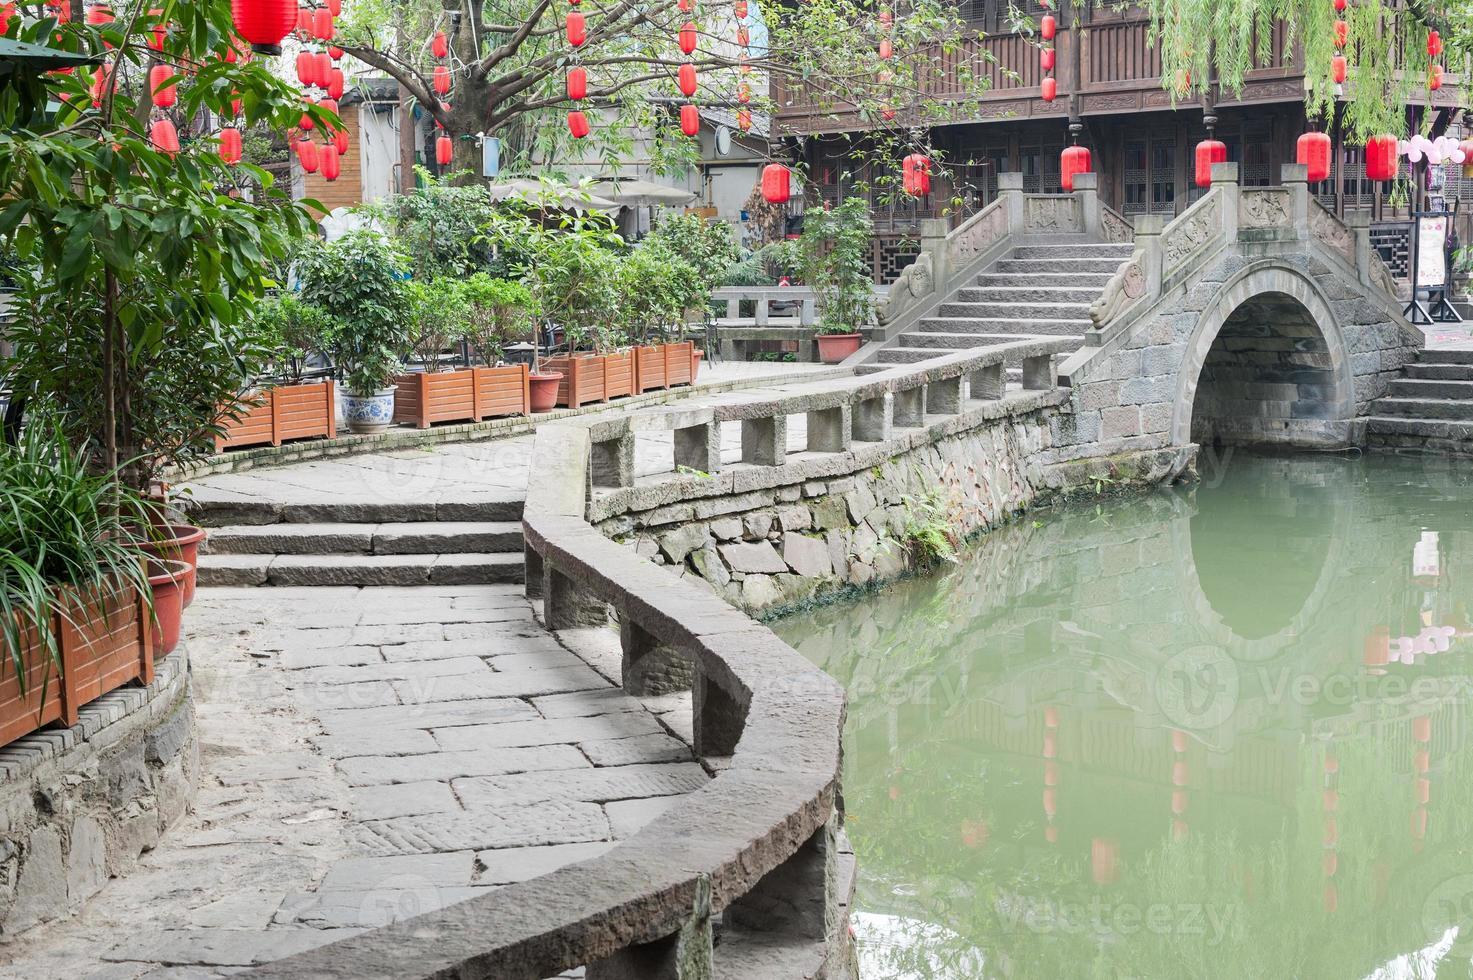 Chengdu - Jinli traditional bridge and chinese lantern photo